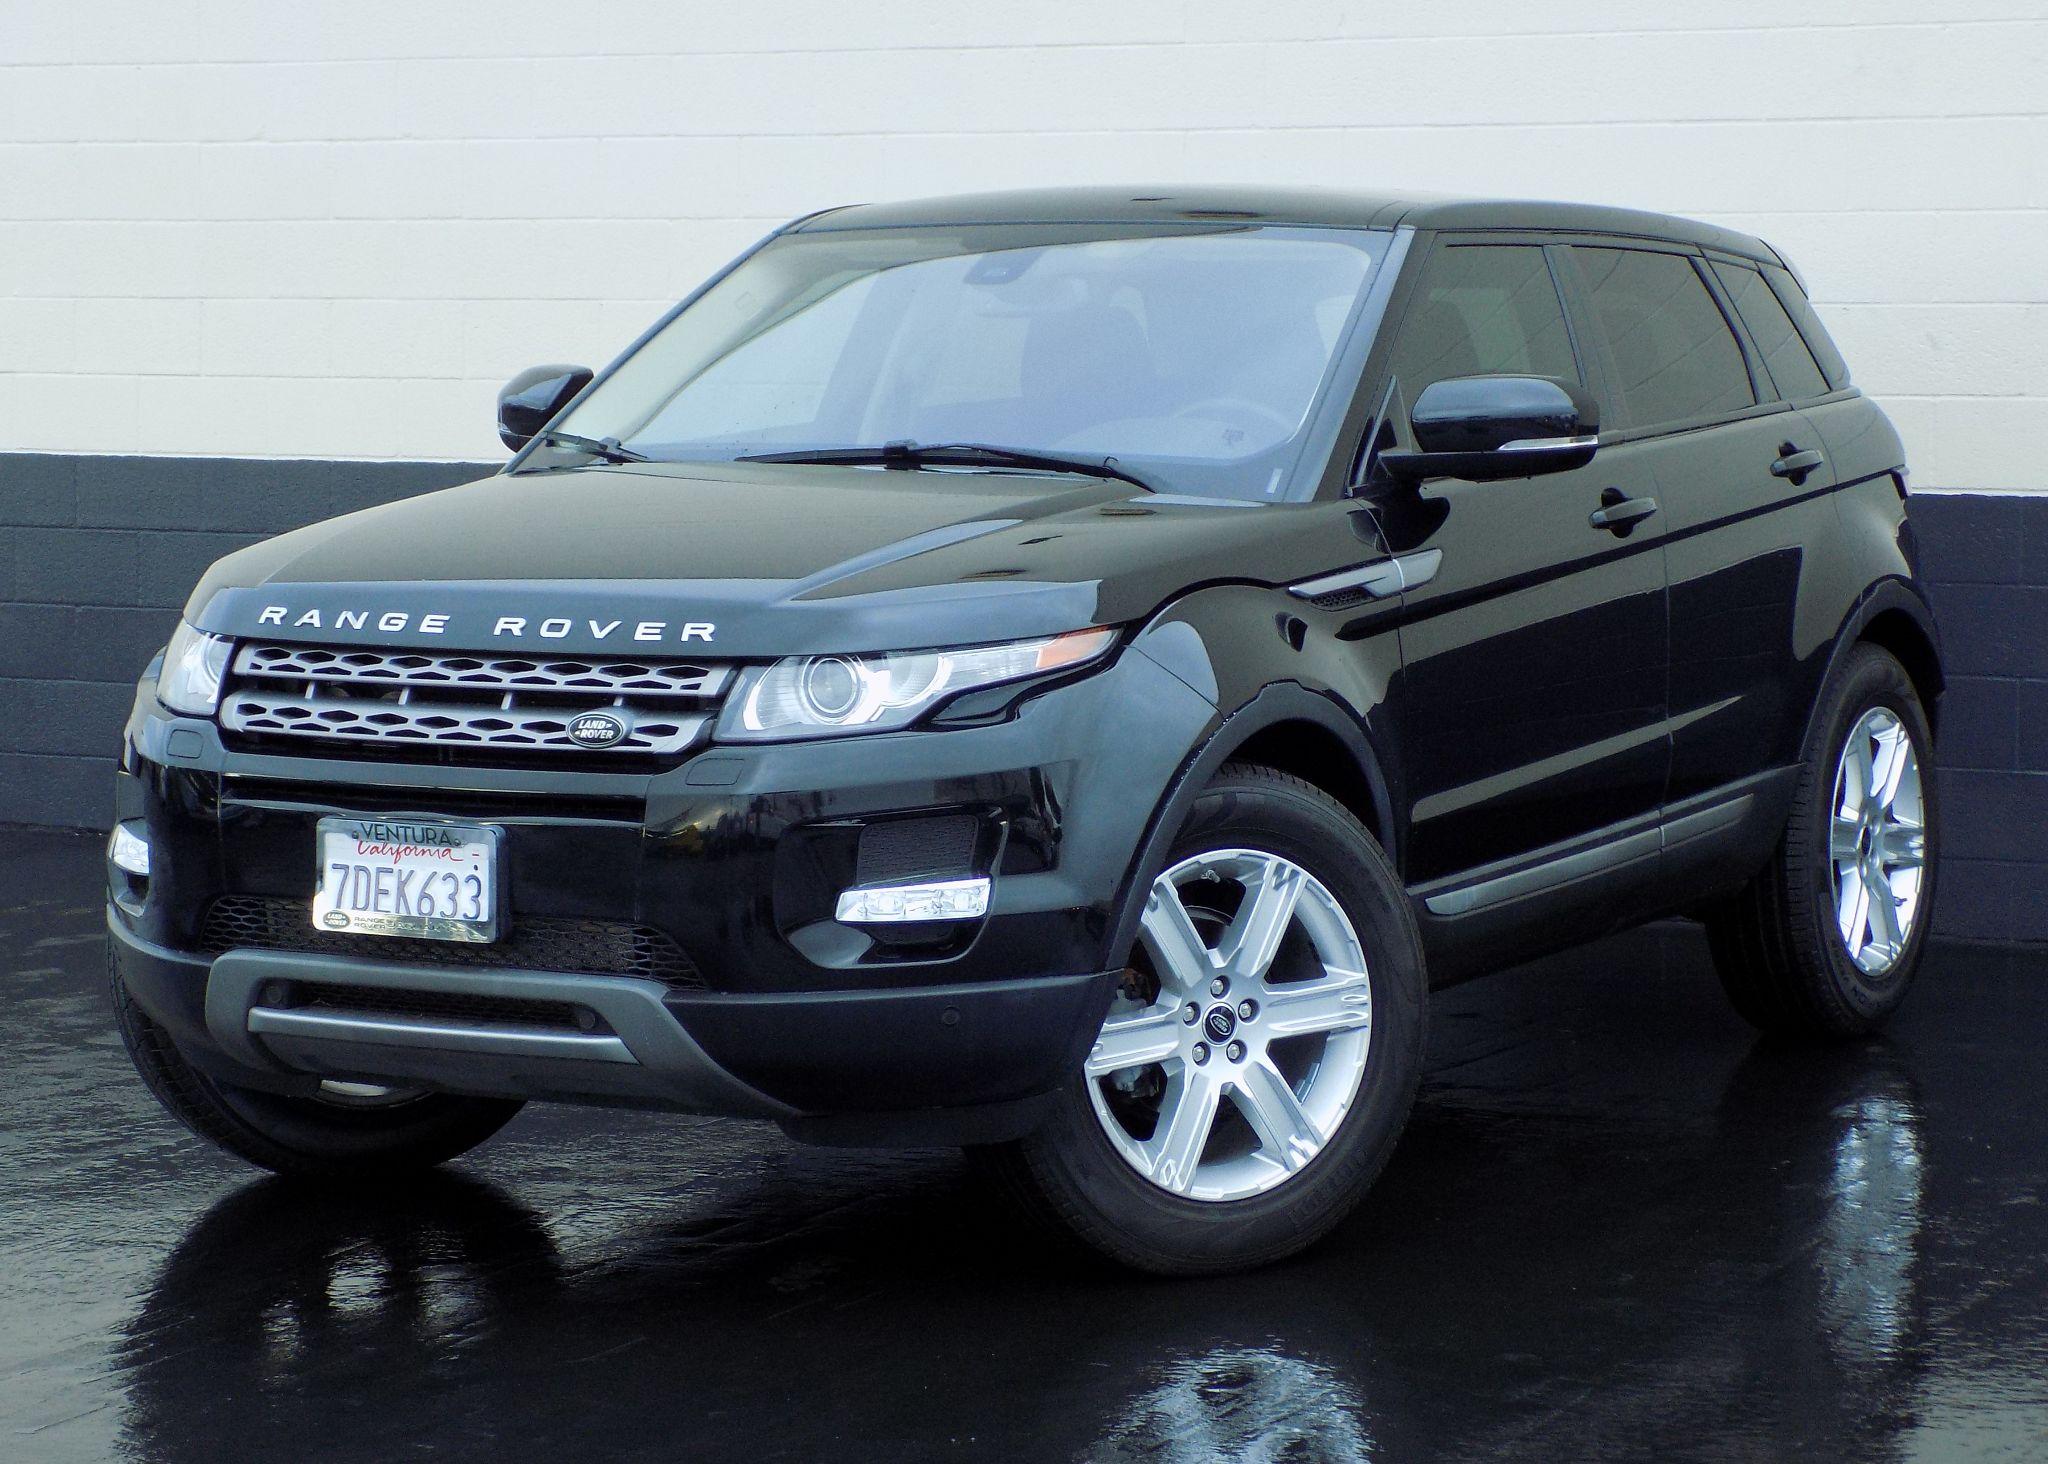 2013 Land Rover Range Rover Evoque in Ventura Certified Land Rover